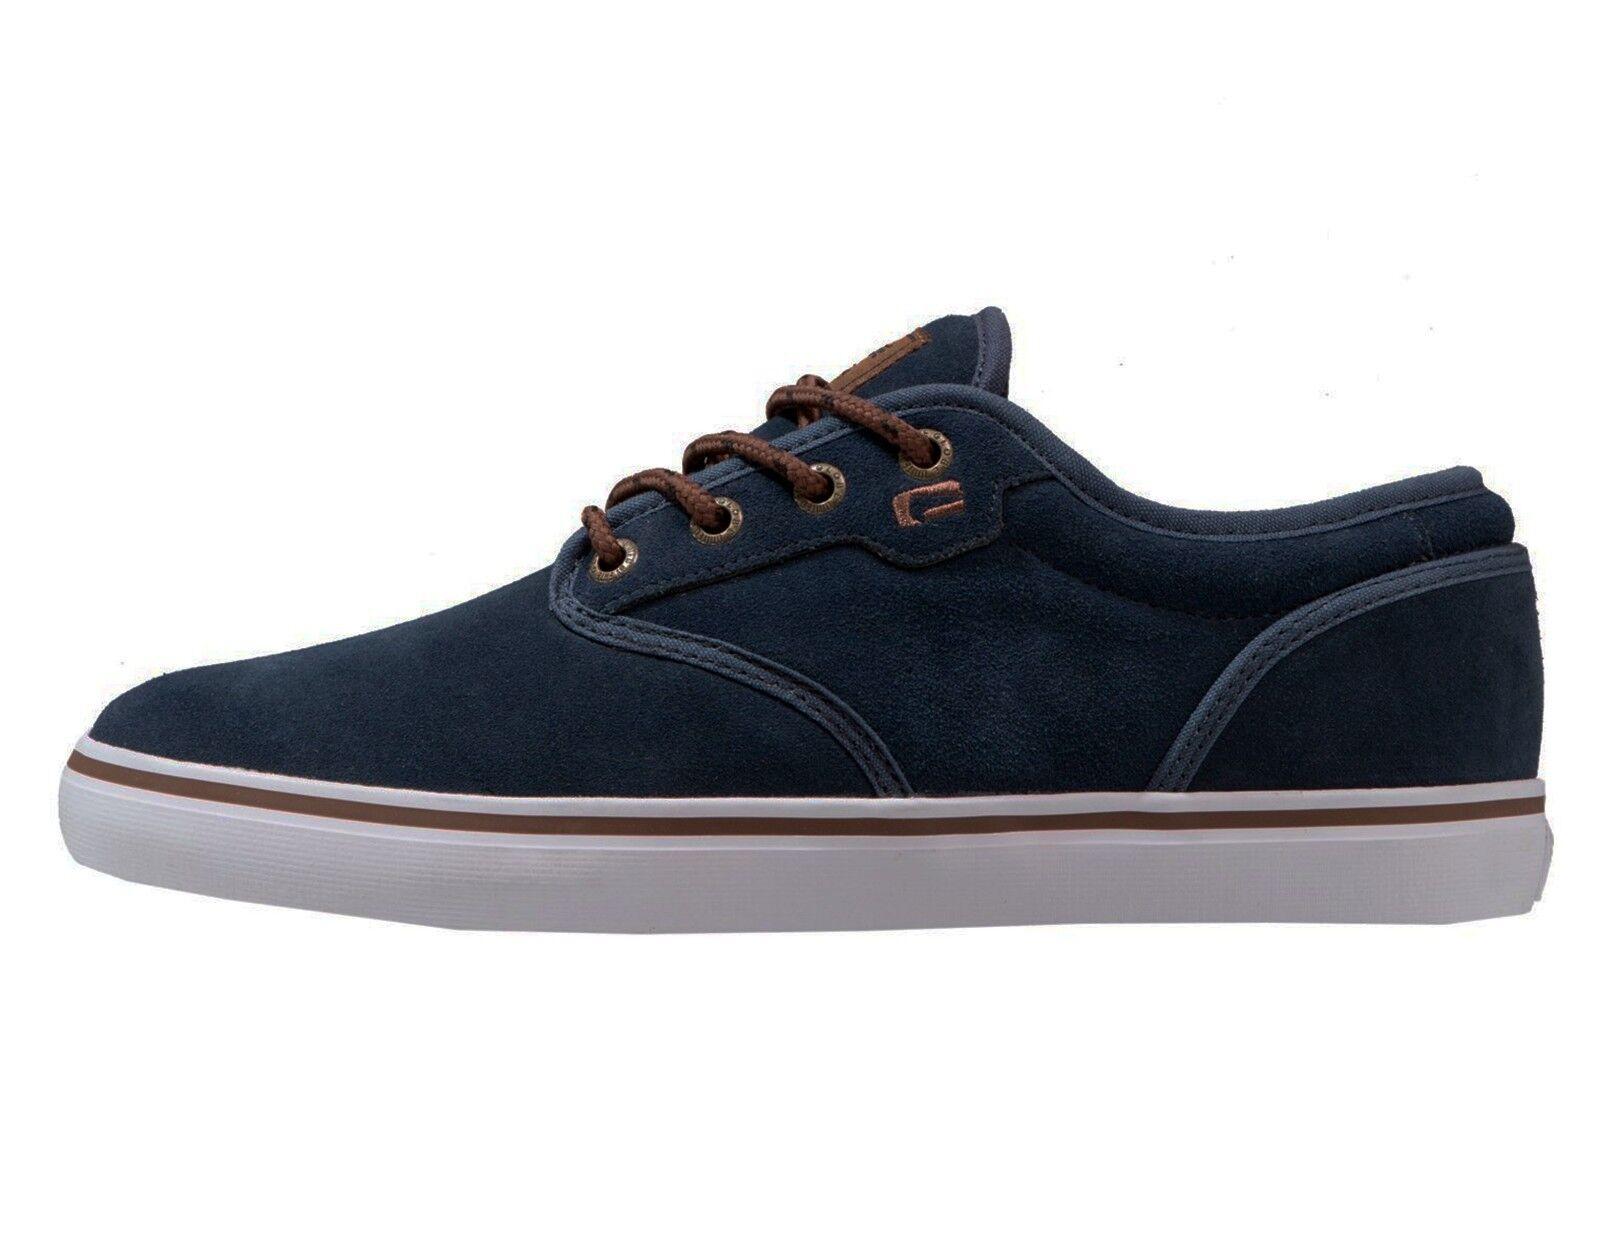 Scarpe Shoes Globe Modello Motley Colore Navy Navy Navy Brown  N°44.5 US Men 11.0 cm 29.0 2c81e1